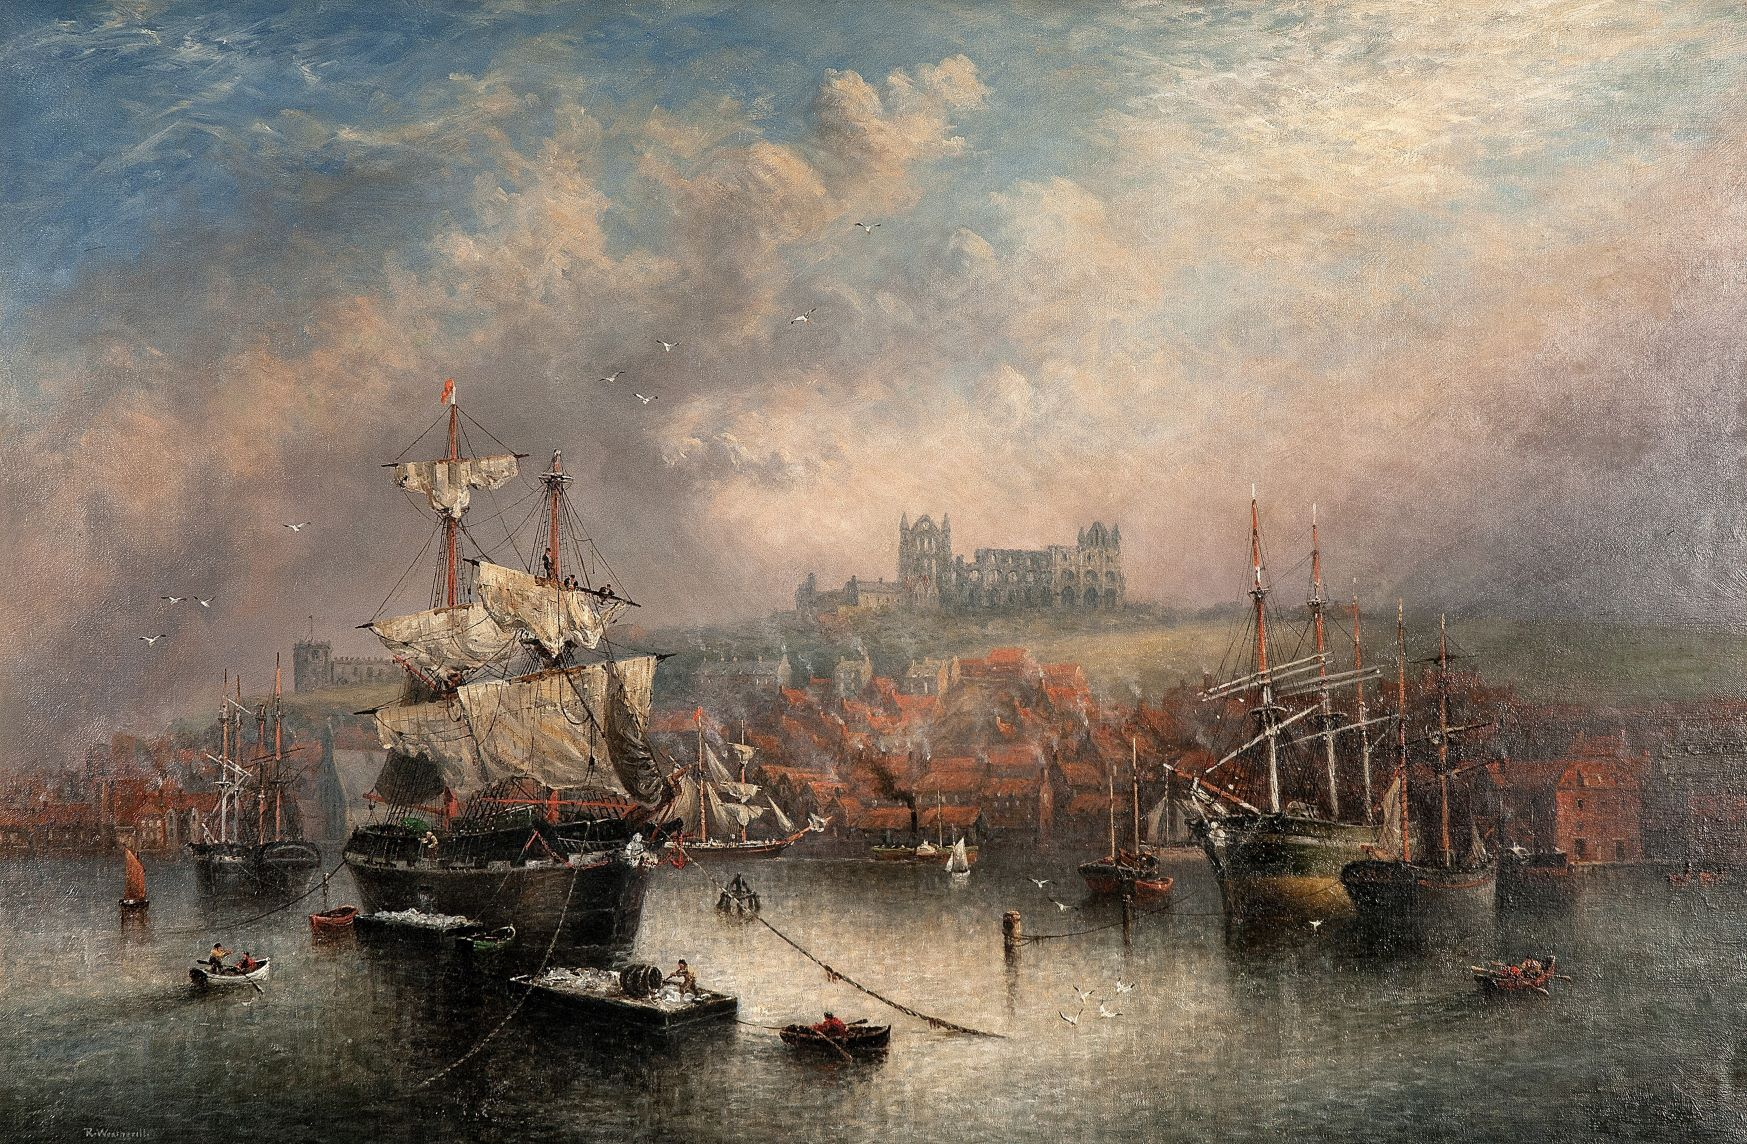 Unloading Cargo by Richard Weatherill (1844 – 1923)